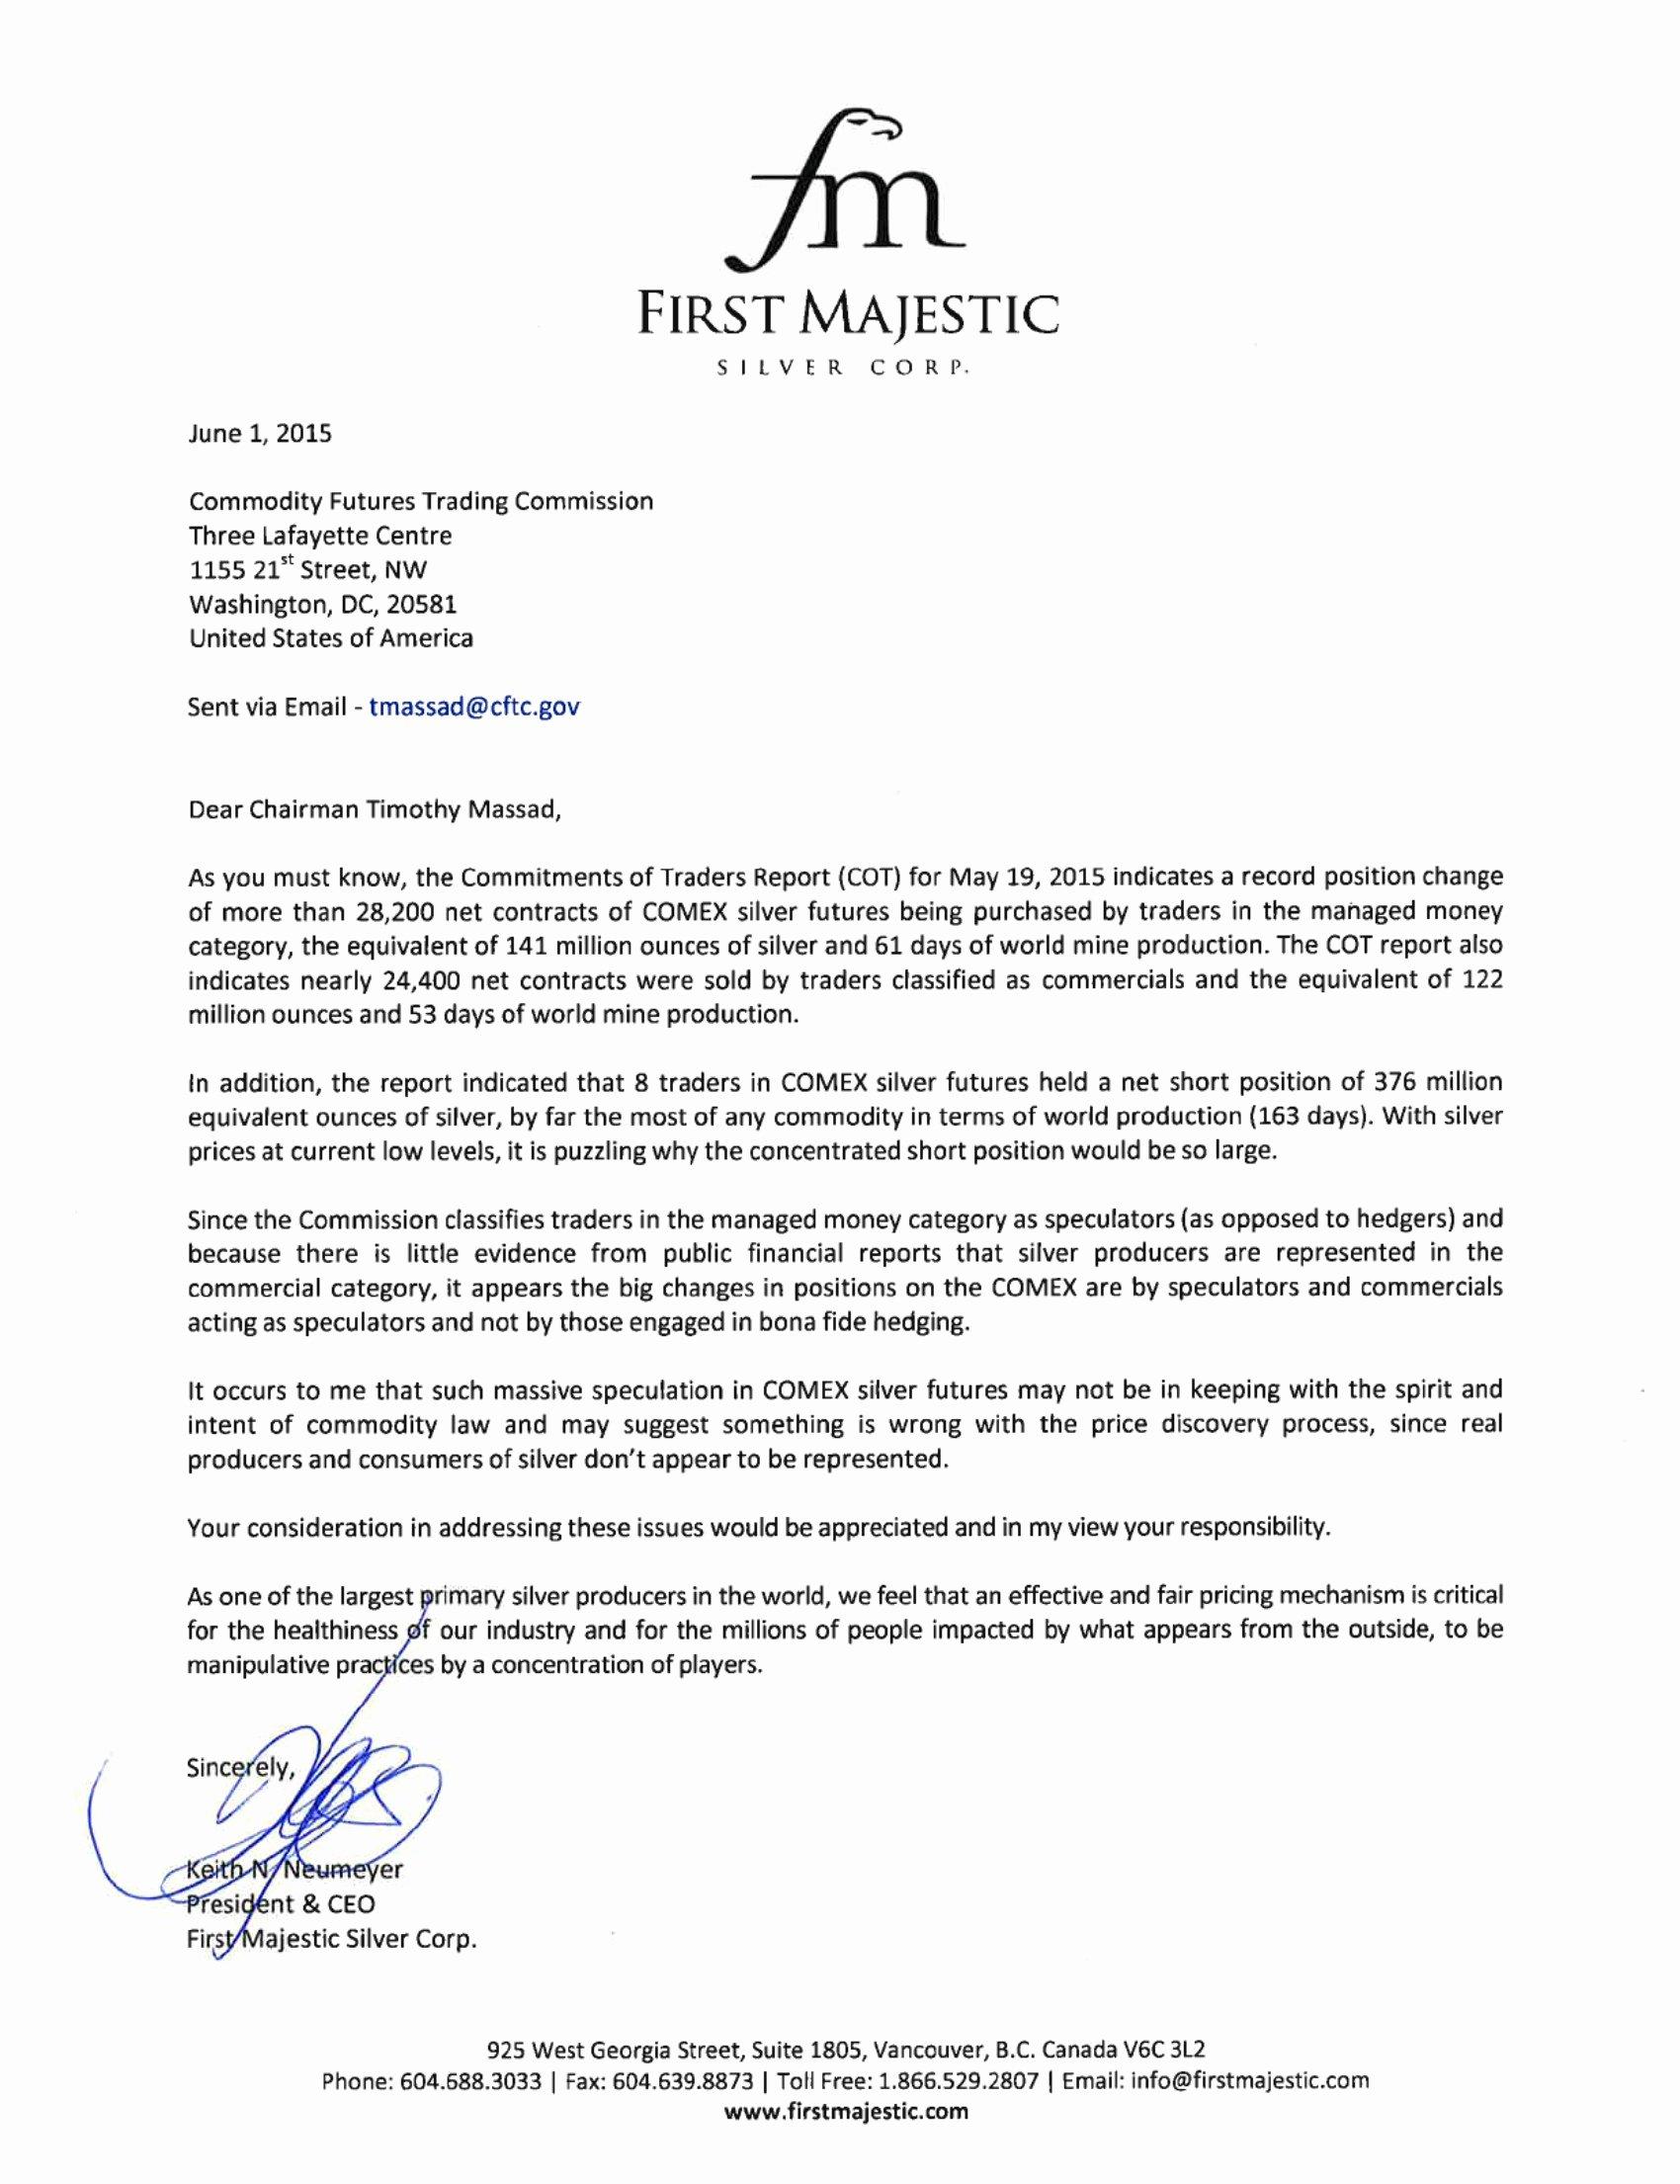 Complaint Response Template Elegant Reply to Patient Plaint Letter Template Collection